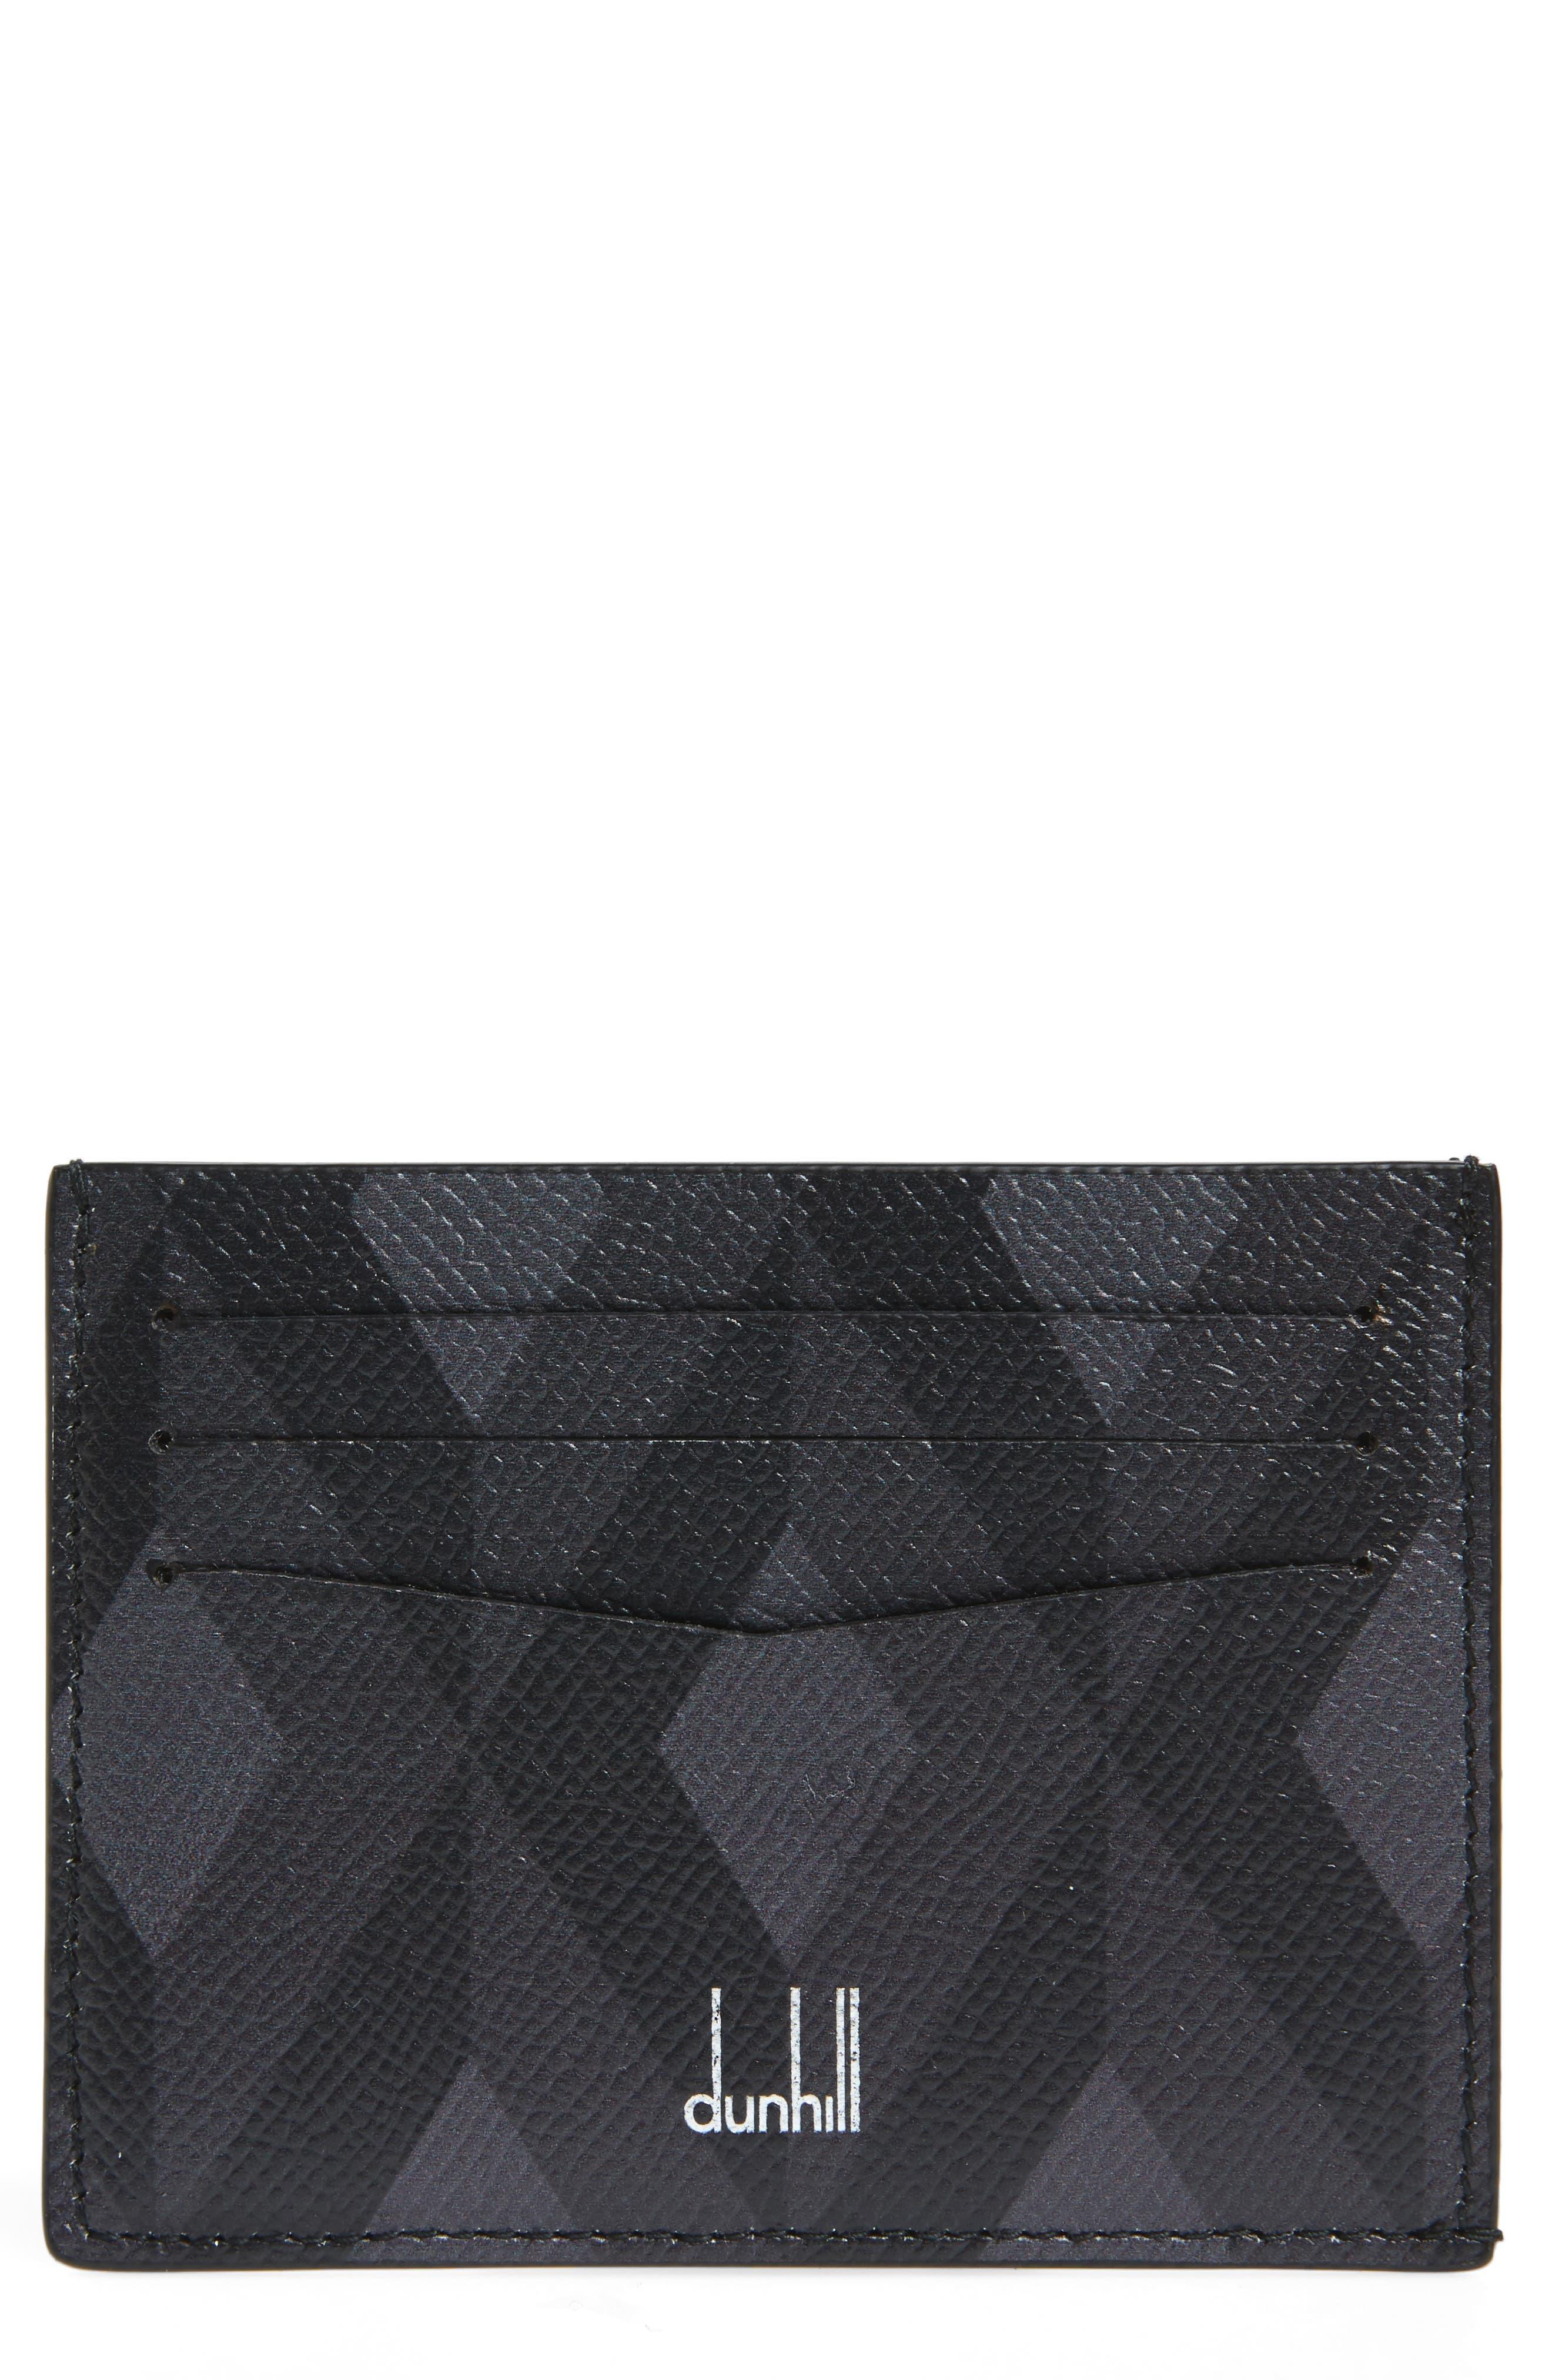 Alternate Image 1 Selected - Dunhill Cadogan Diamond Print Leather Card Case